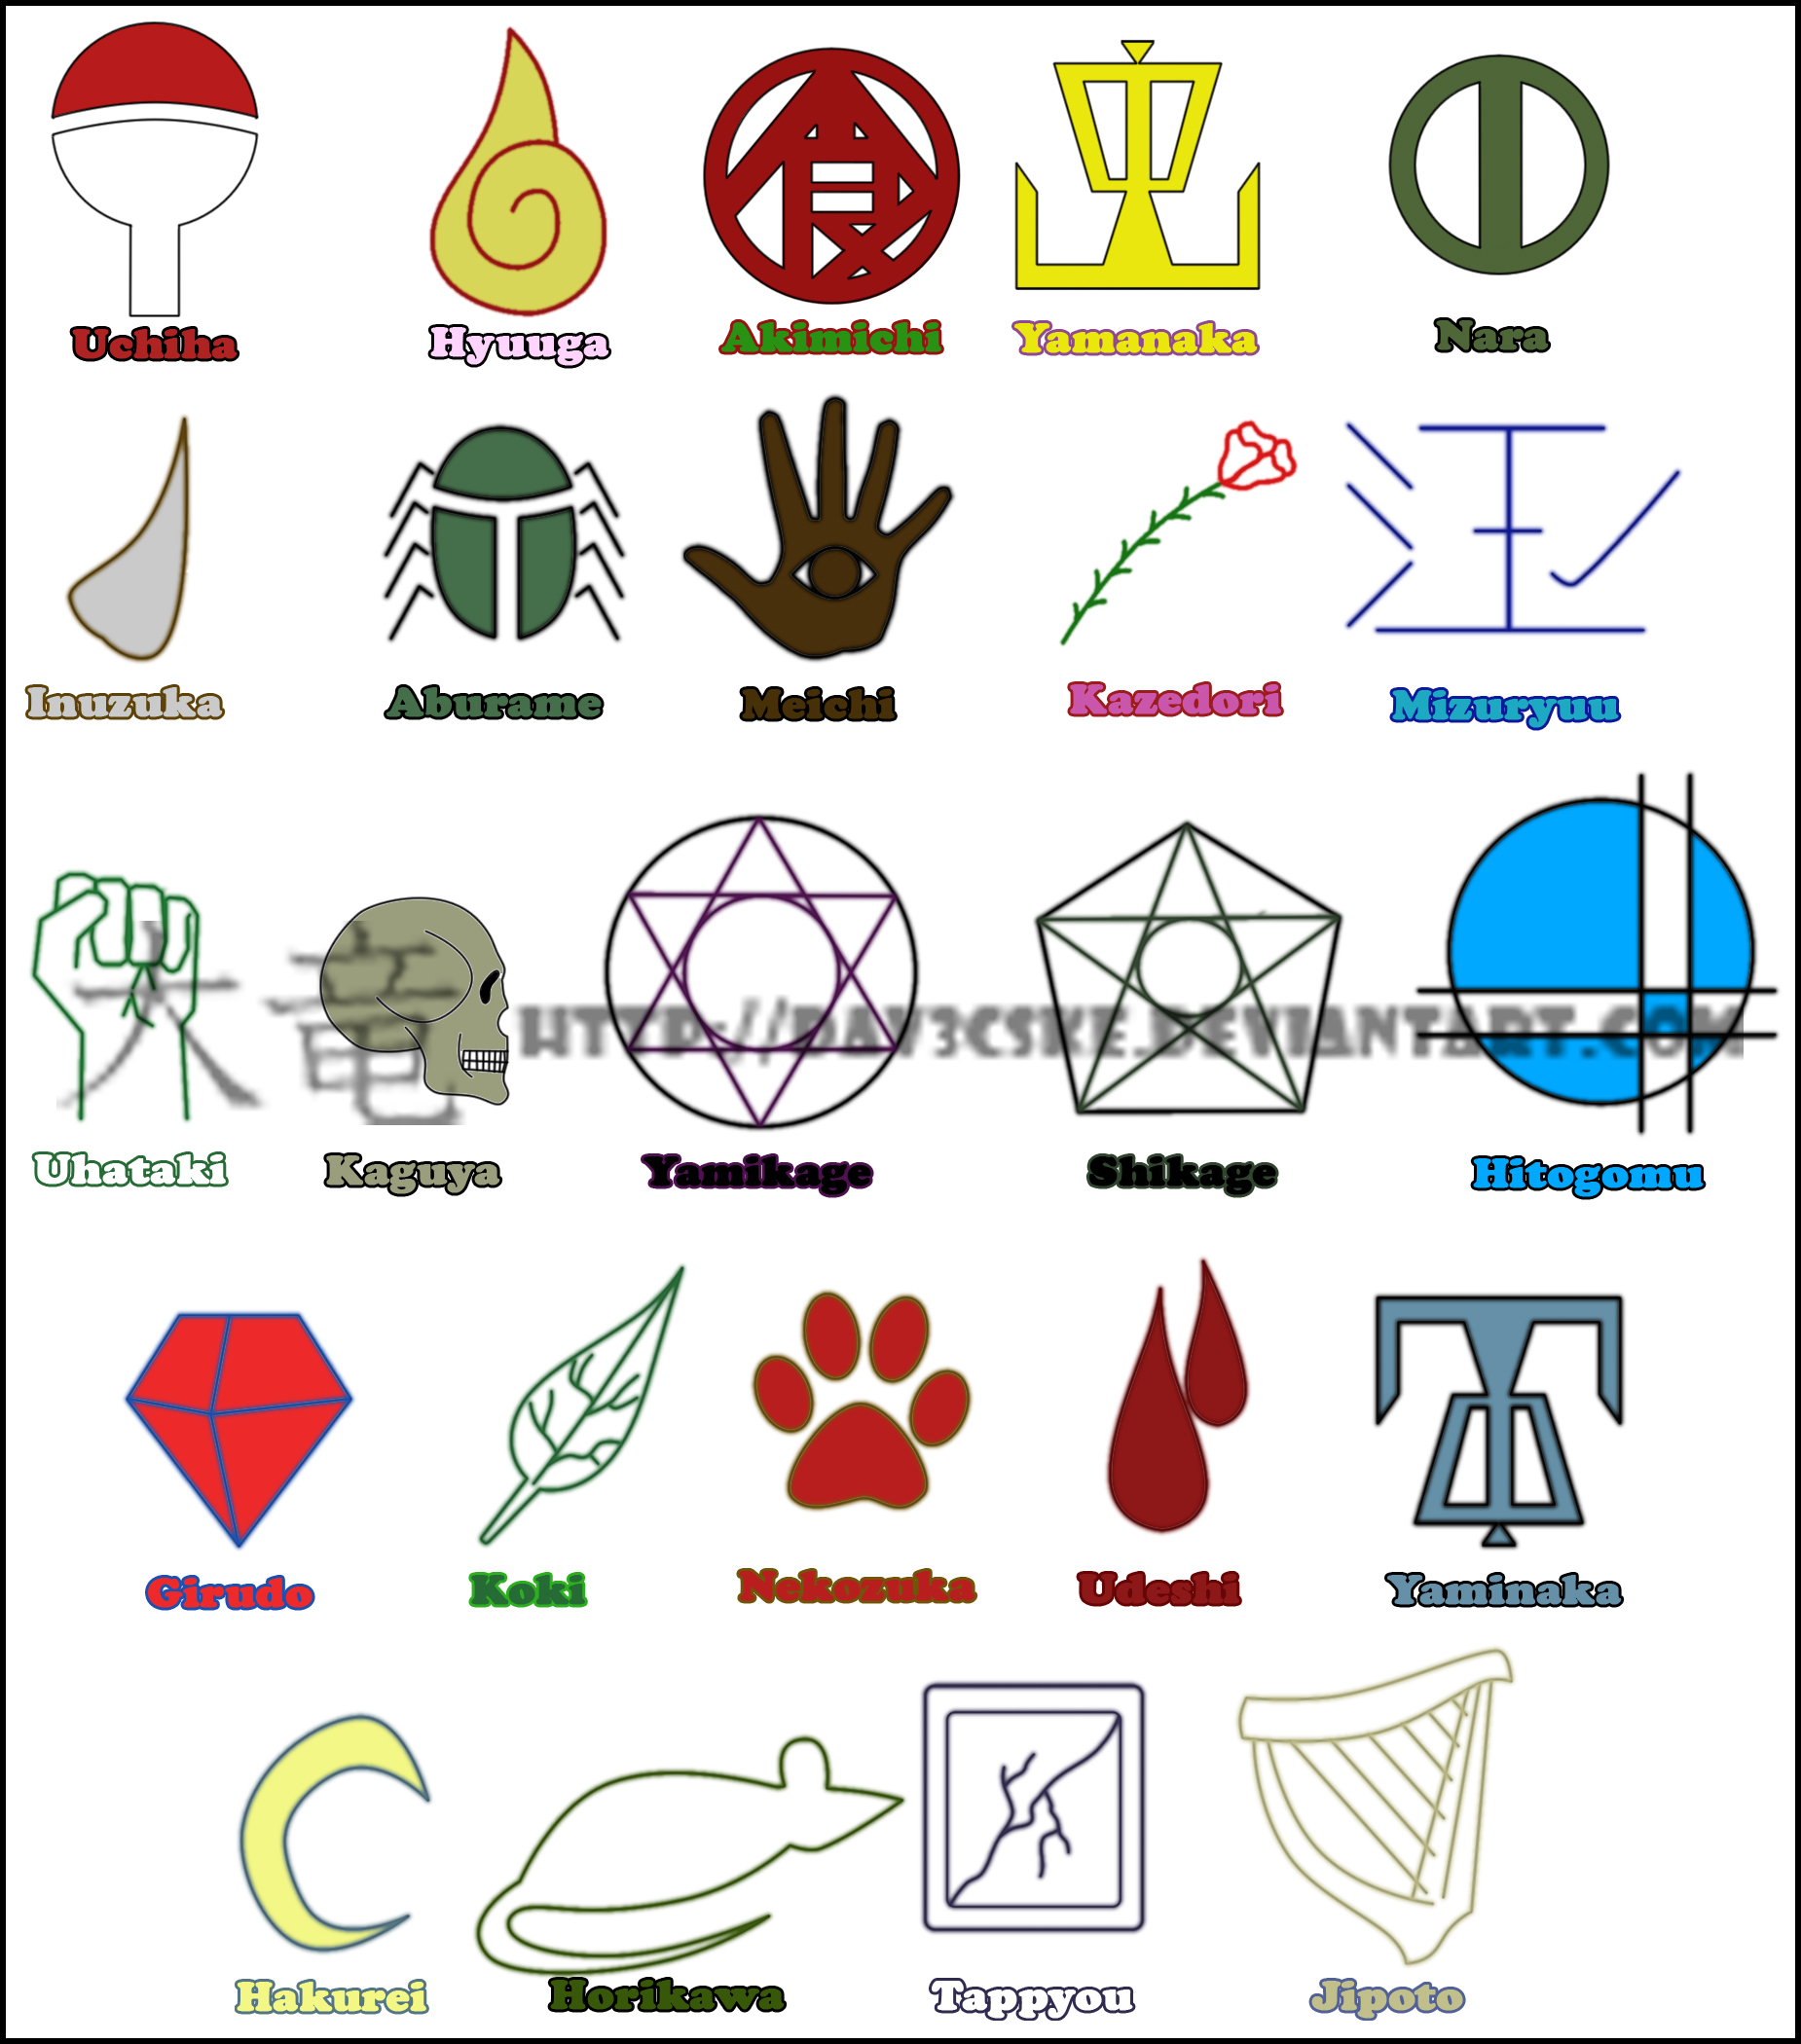 Clan Symbols By Dav3cske